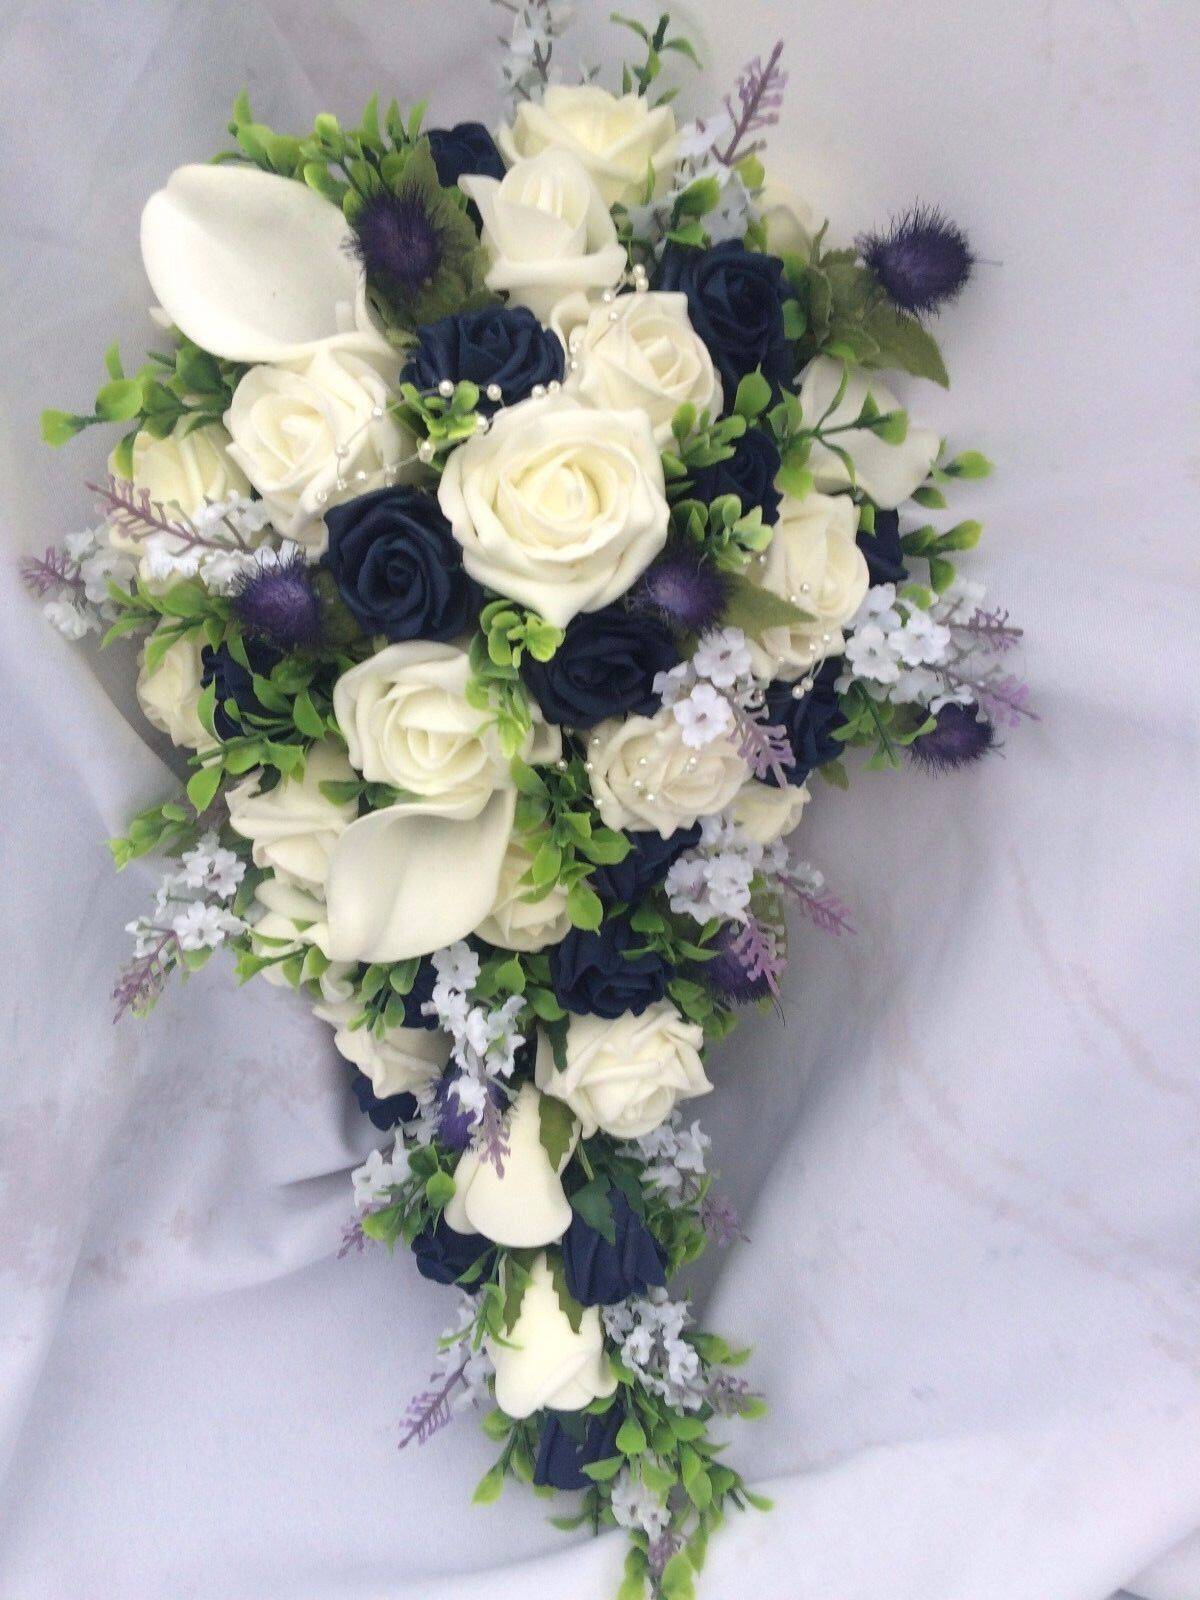 Scottish Wedding Flowers Bride's Bouquet Thistles, Lavender, Calla ,Ivory & Navy